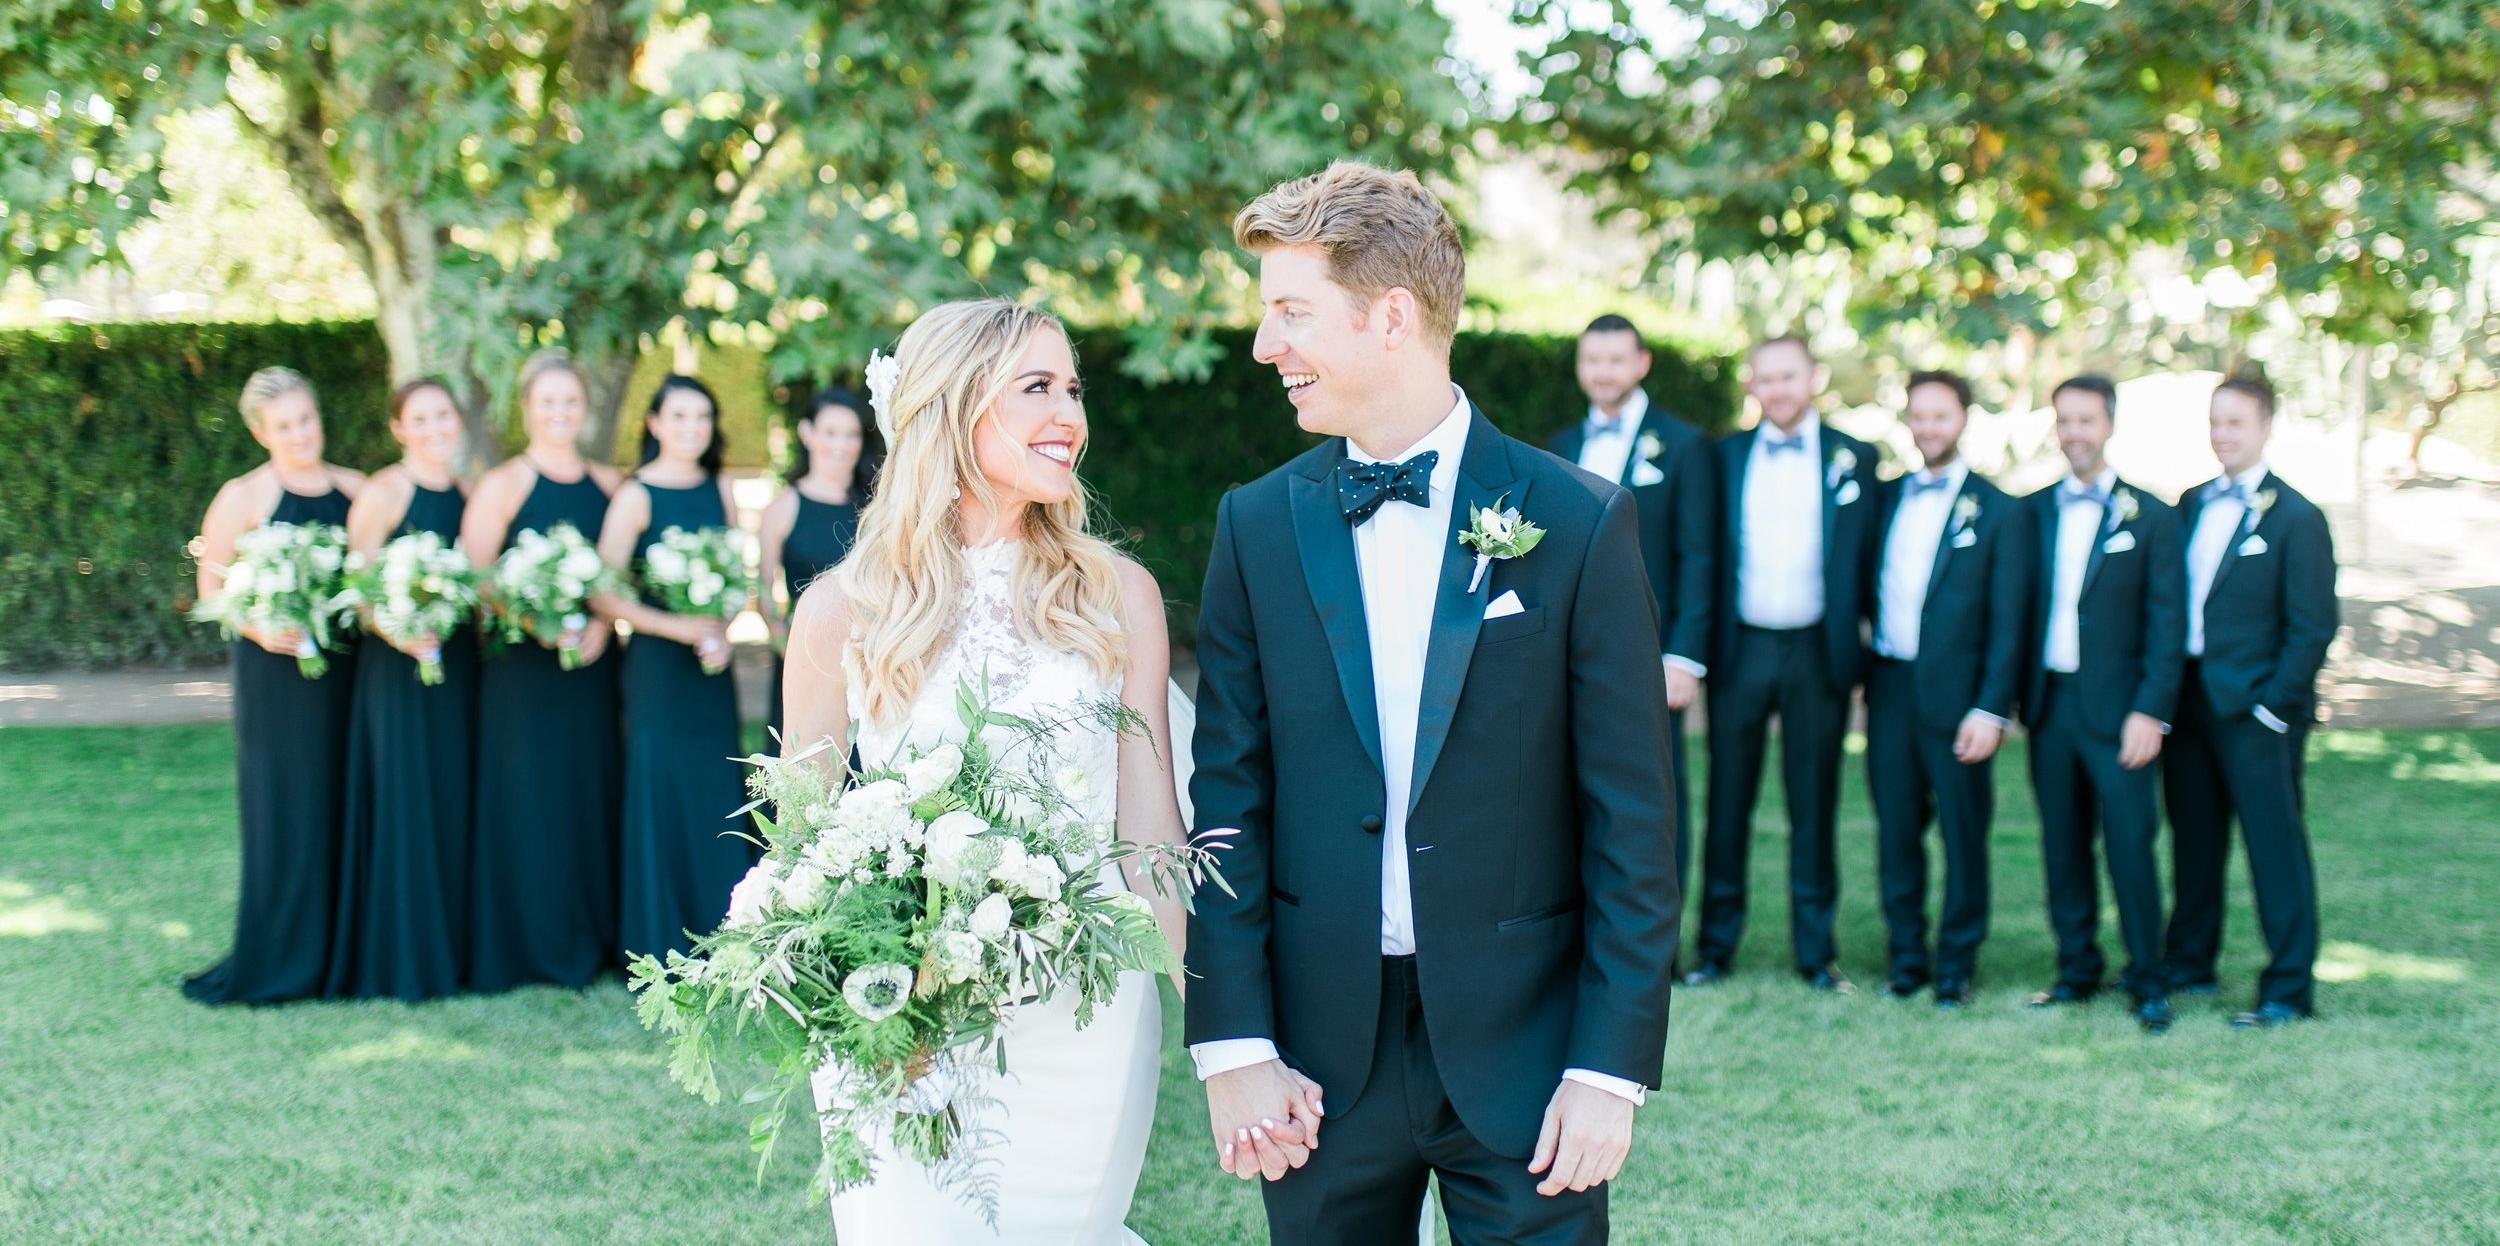 Cornerstone-Wedding-Photos-by-JBJ-Pictures